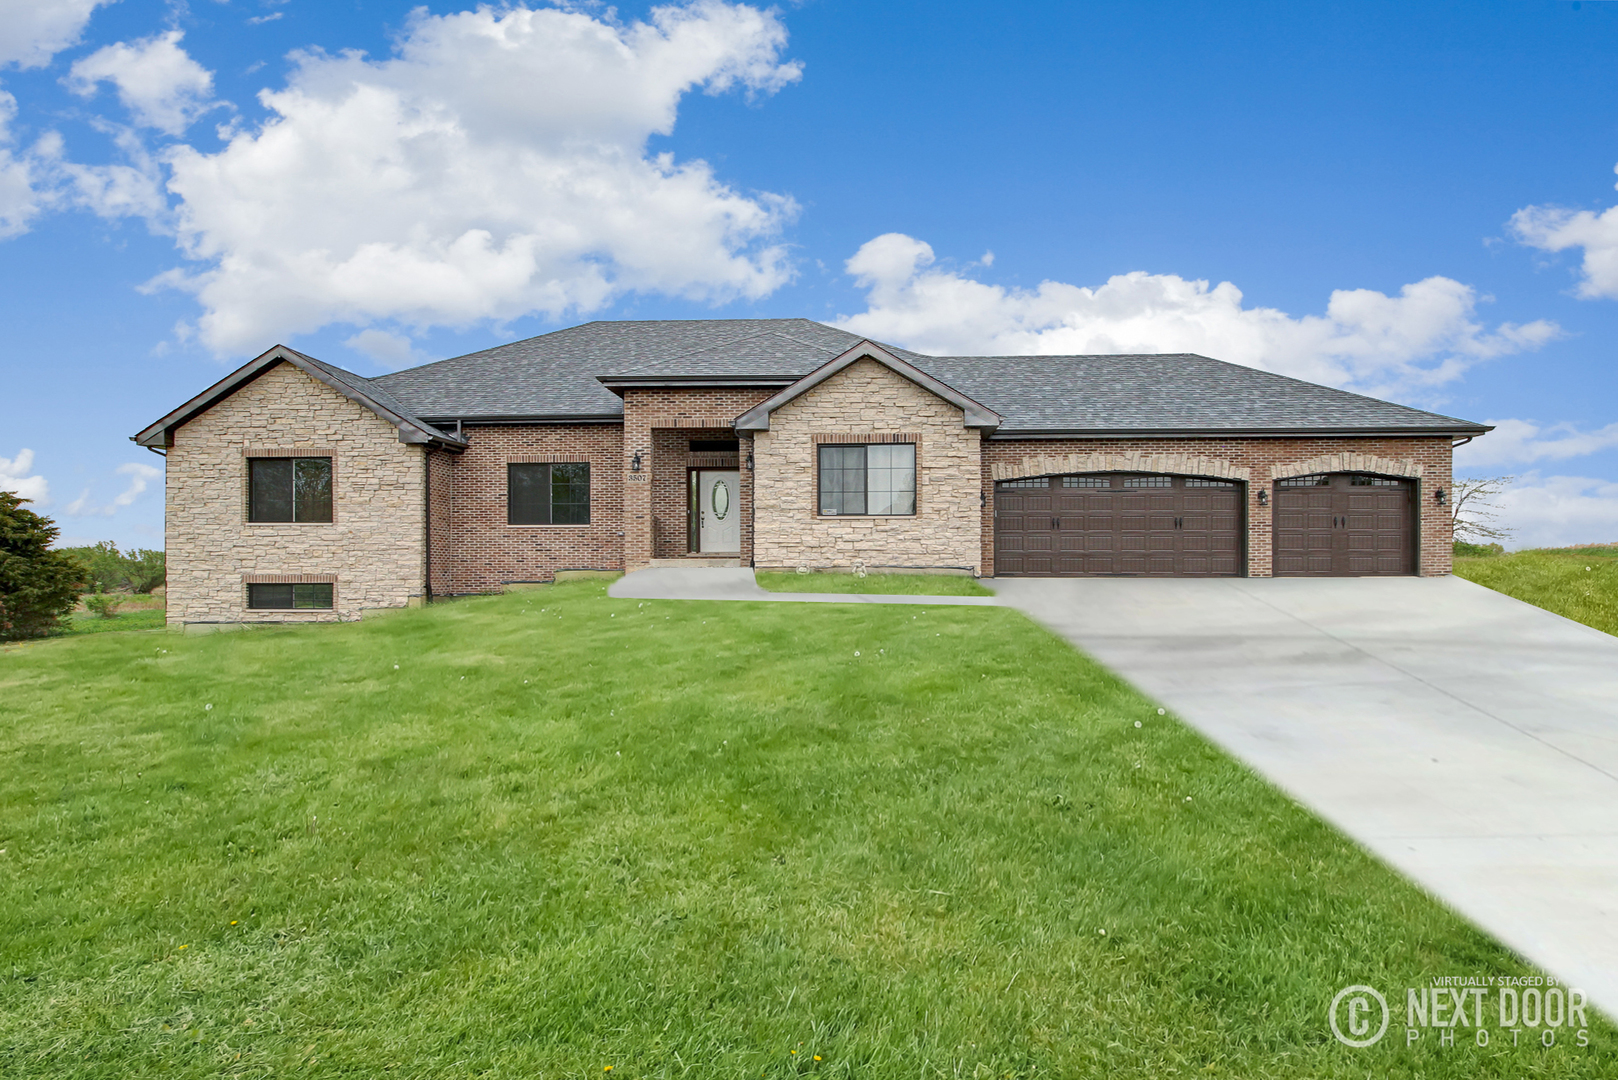 3526 West Pinewood, Monee, Illinois, 60449